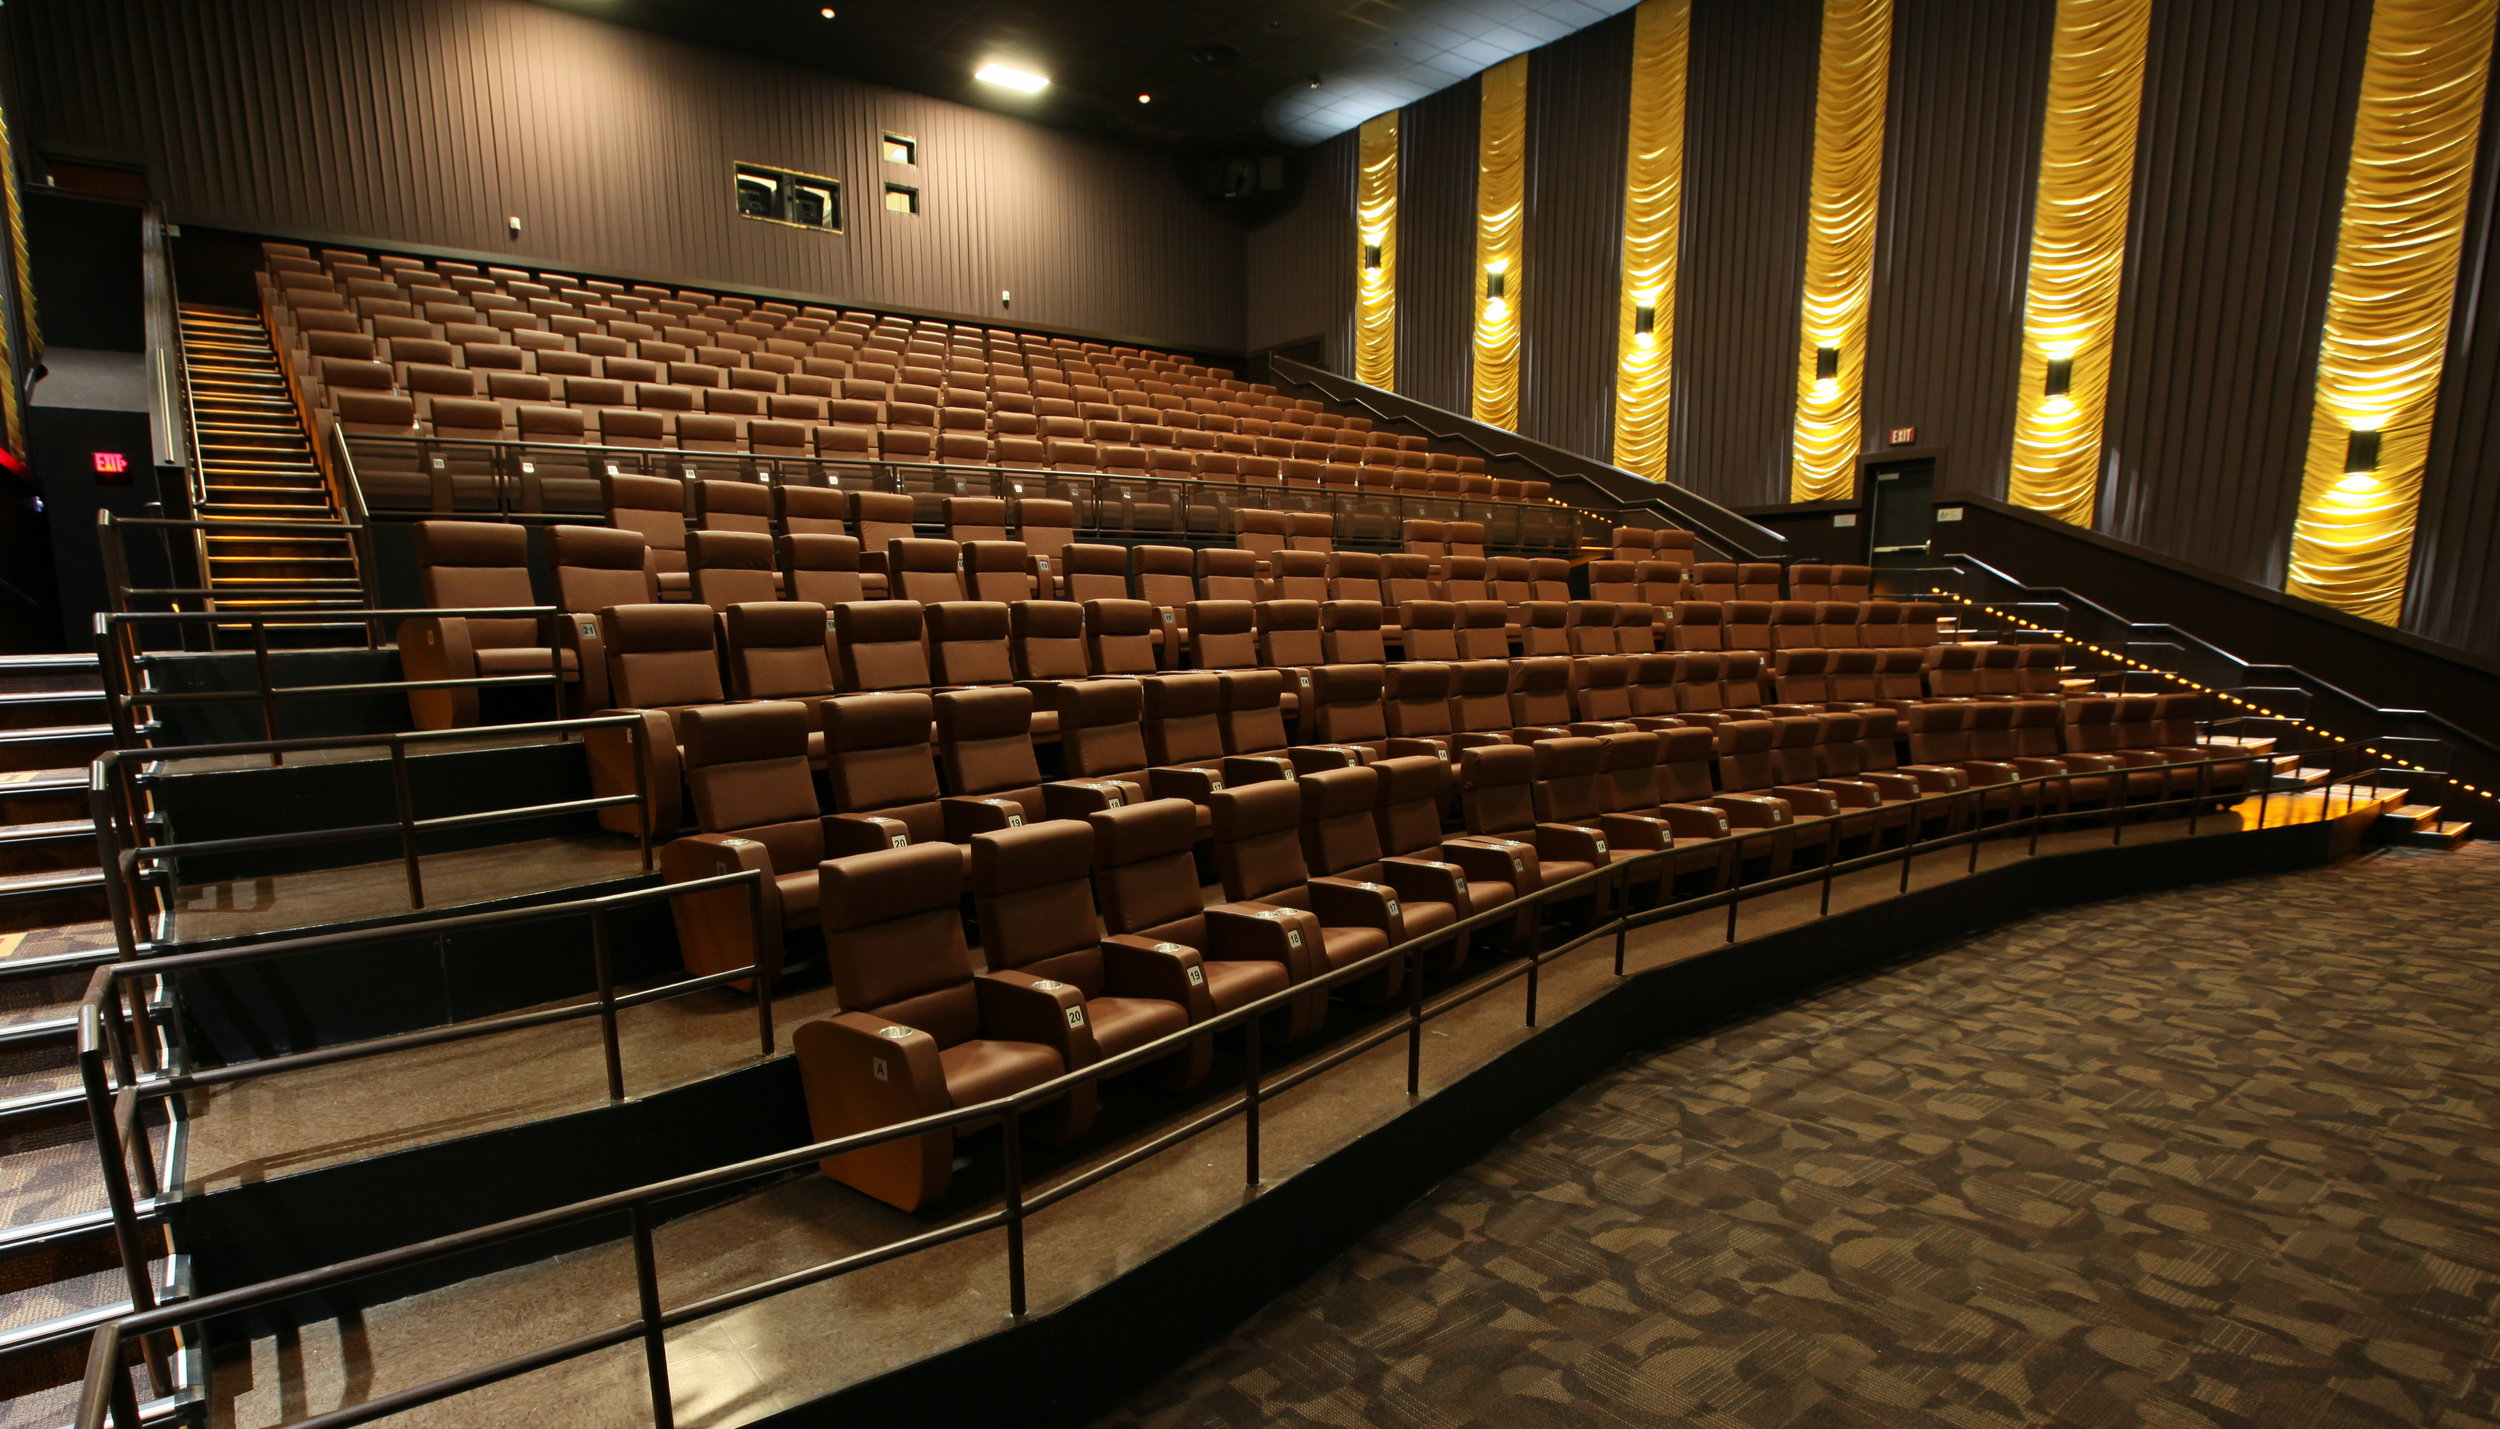 ADW-Entertainment-CineBowl-Grille-Blacksburg-VA-12.jpg